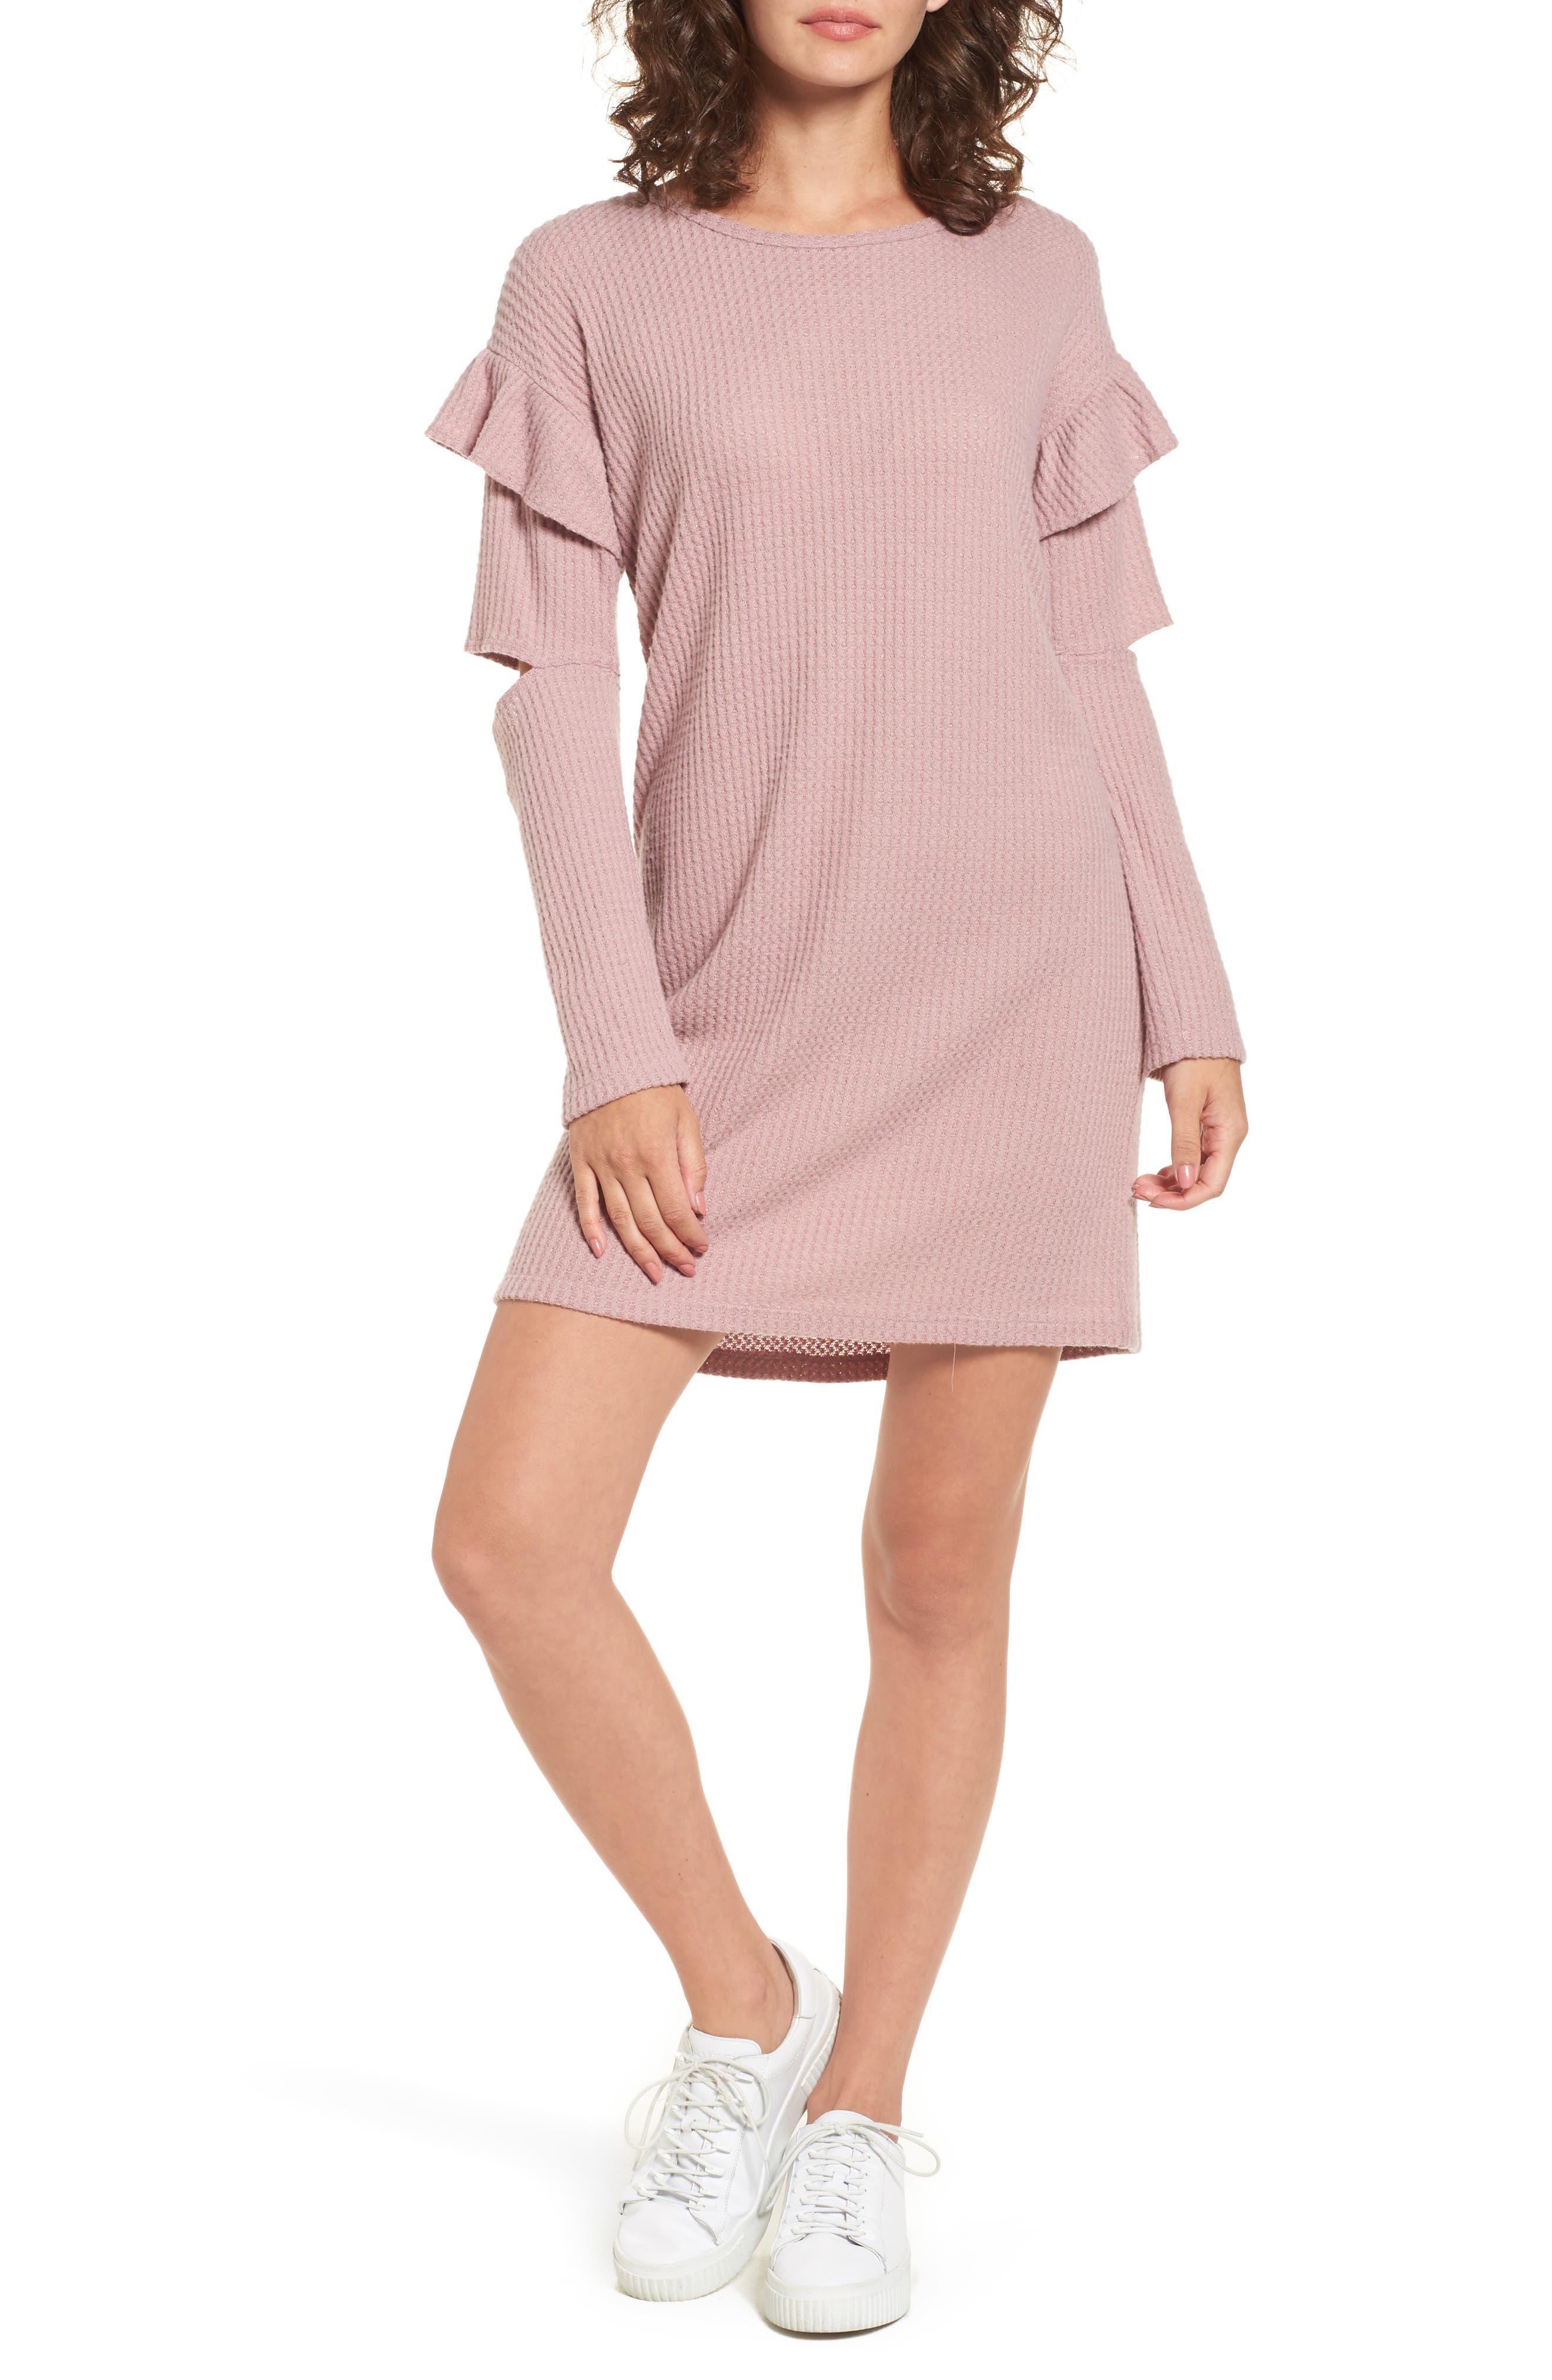 Everly Ruffle Sleeve Knit Dress